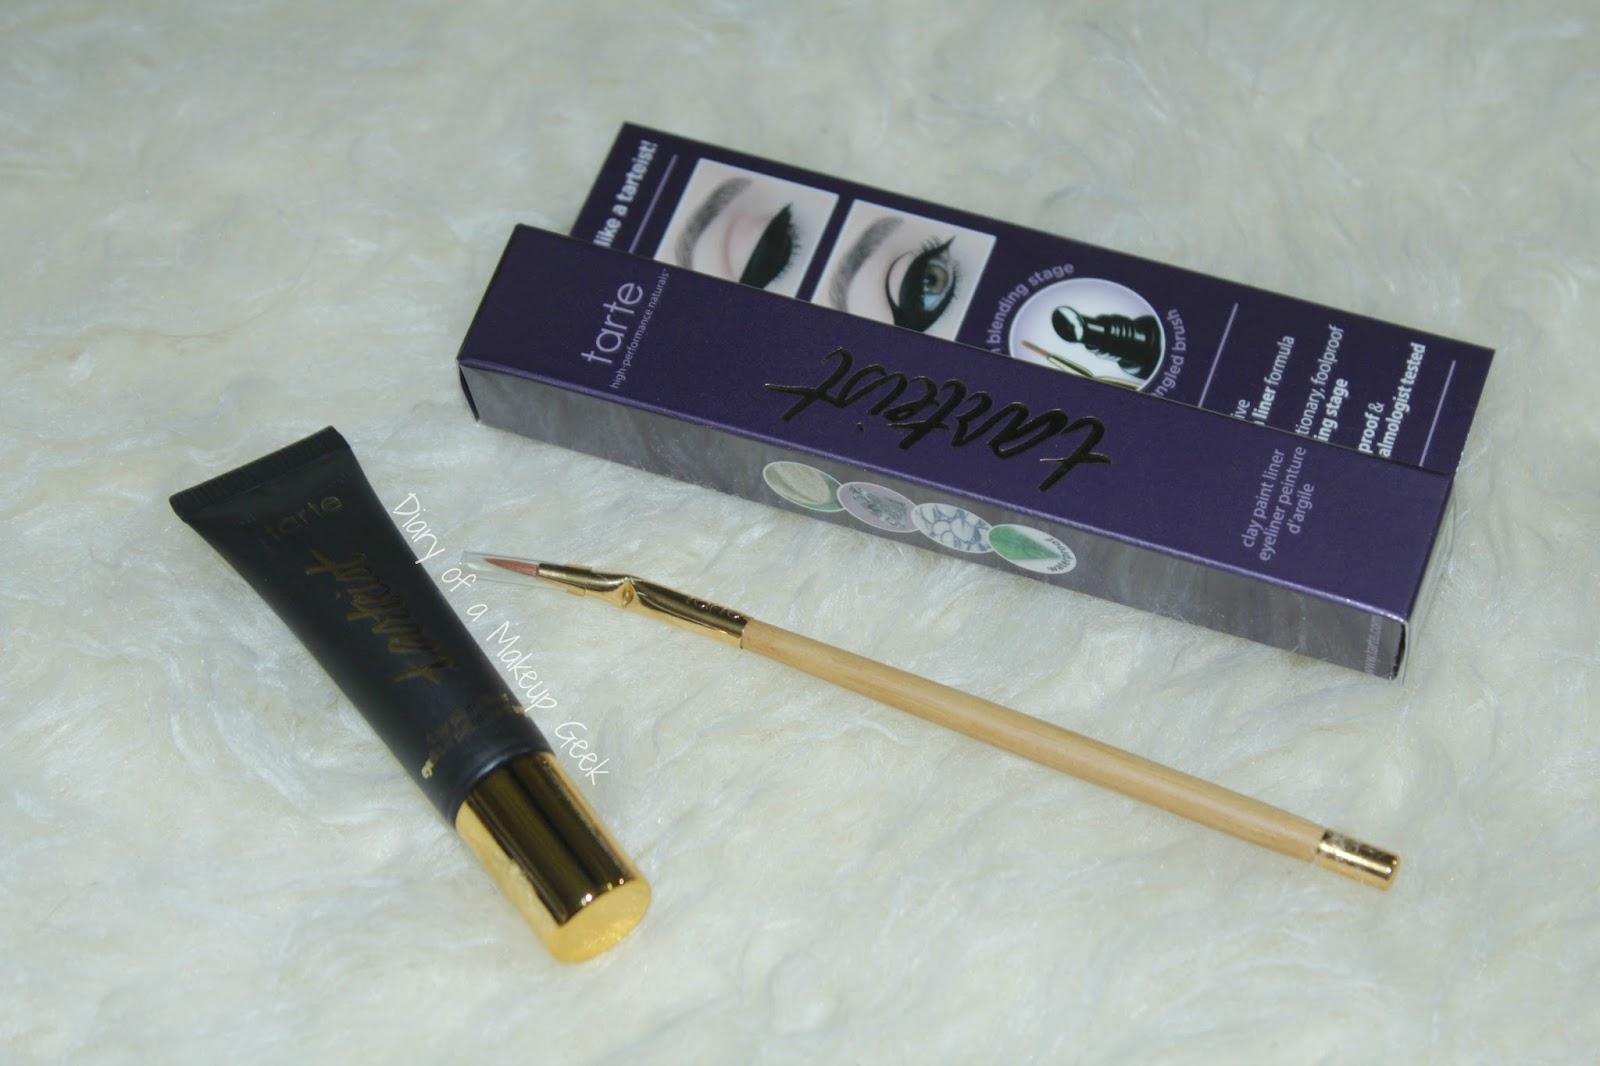 Diary of a makeup geek blog tarte tarteist clay paint for Tarteist clay paint liner